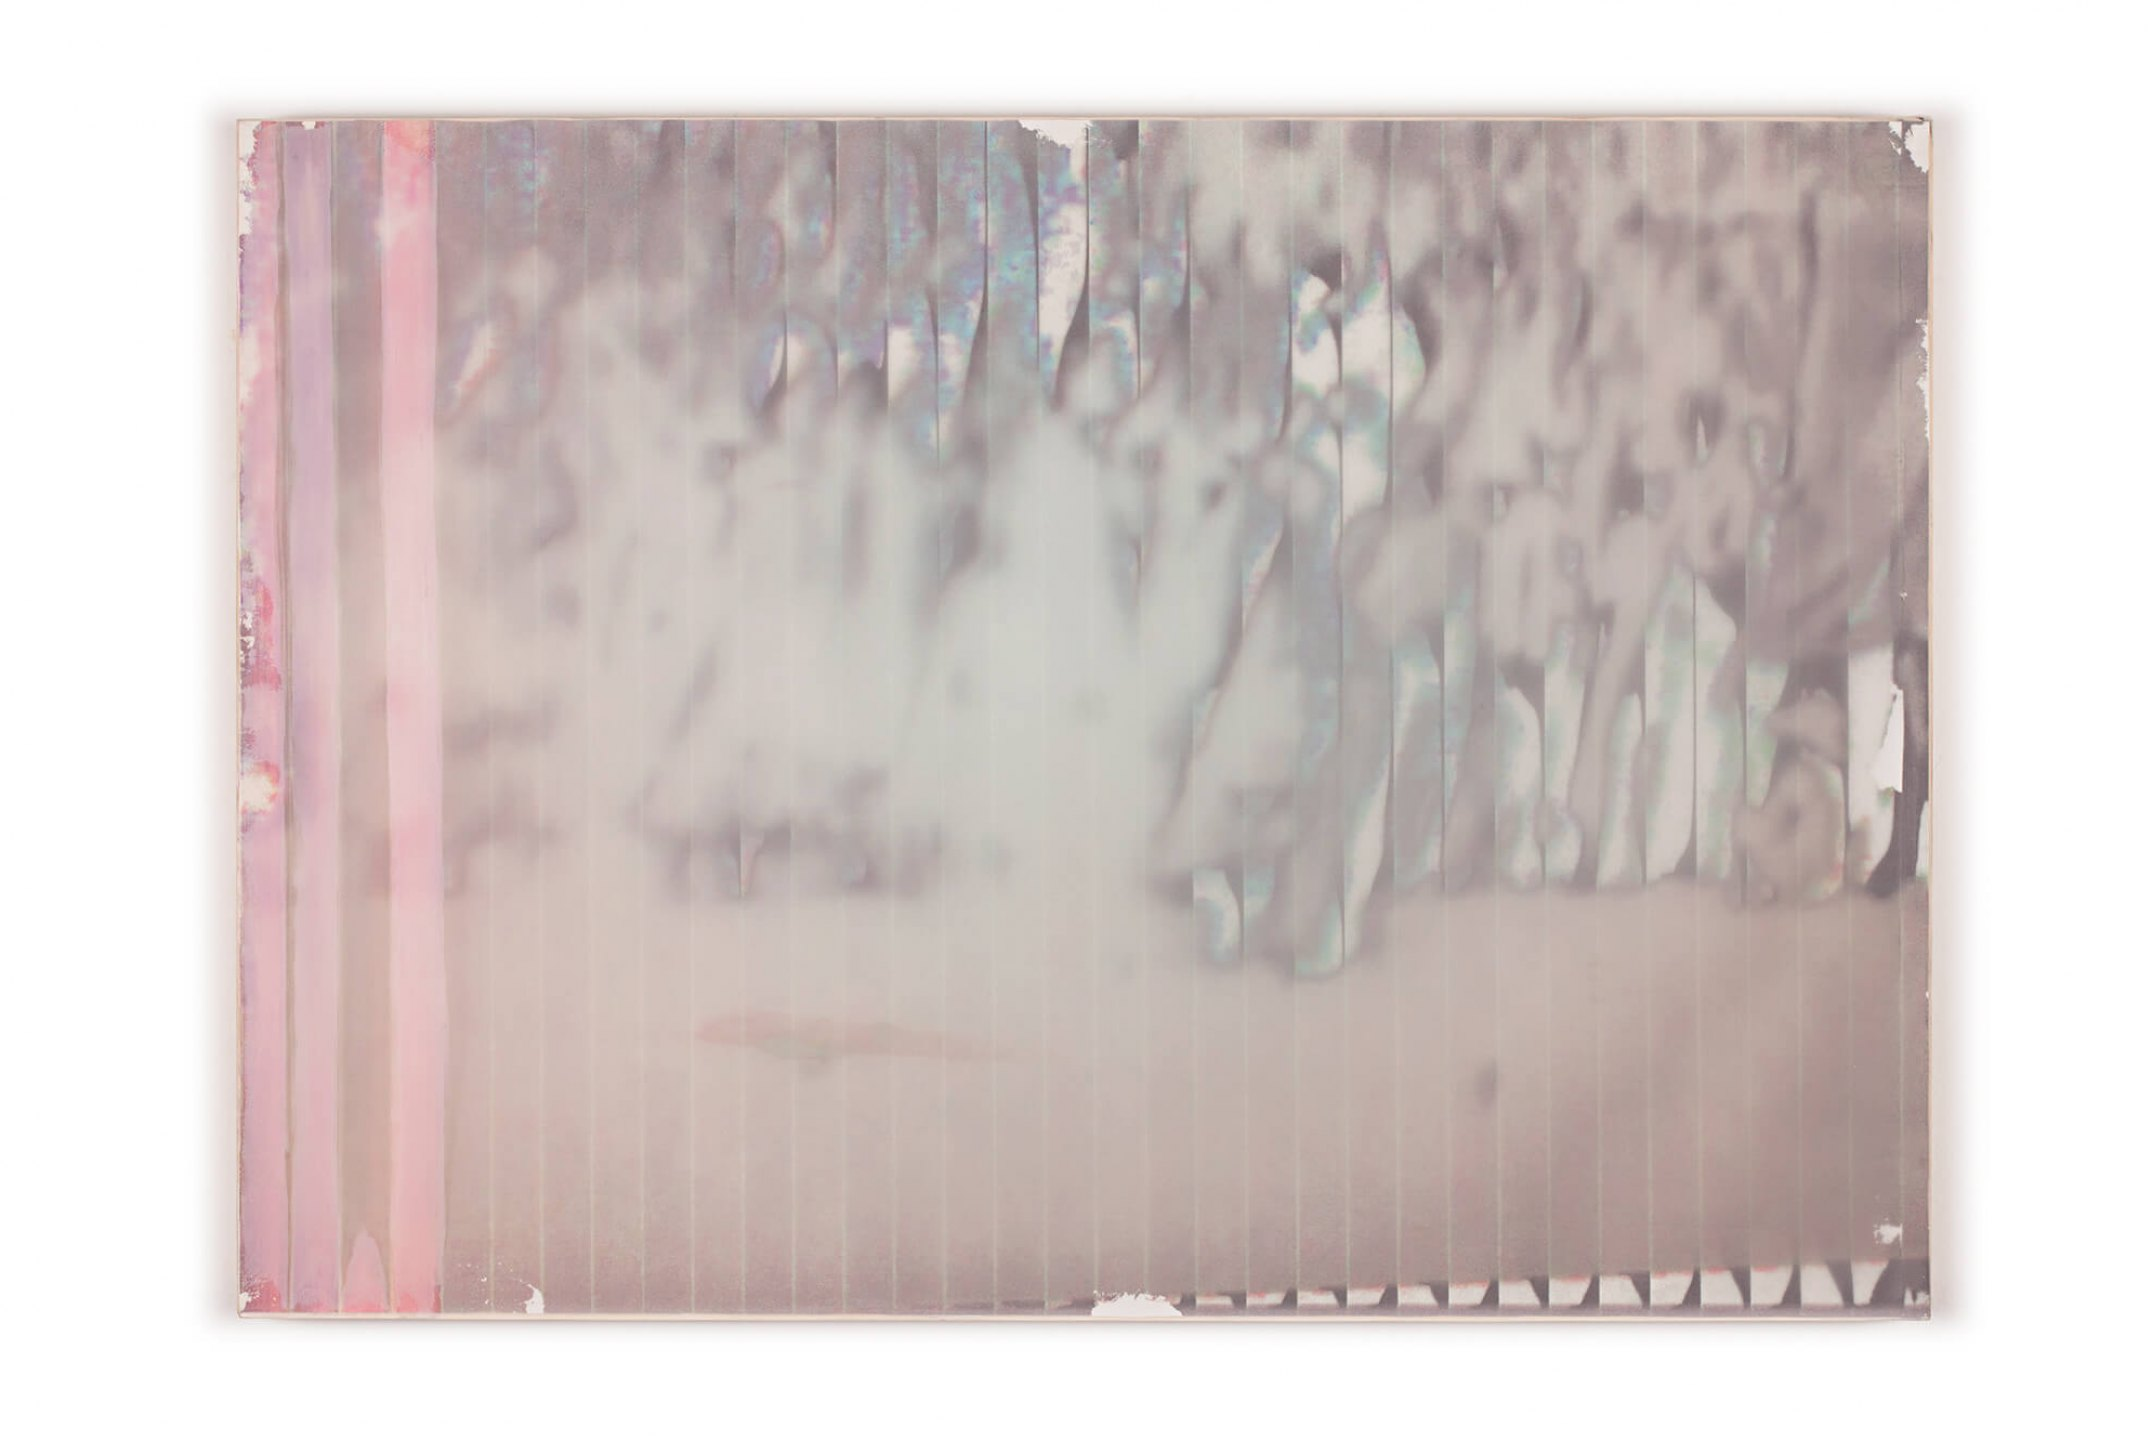 Marina Perez Simão,<em> Untitled</em>, 2013, reflexive pigment on polyester and fire-proof paper print, 63&nbsp;× 88,5 cm - Mendes Wood DM